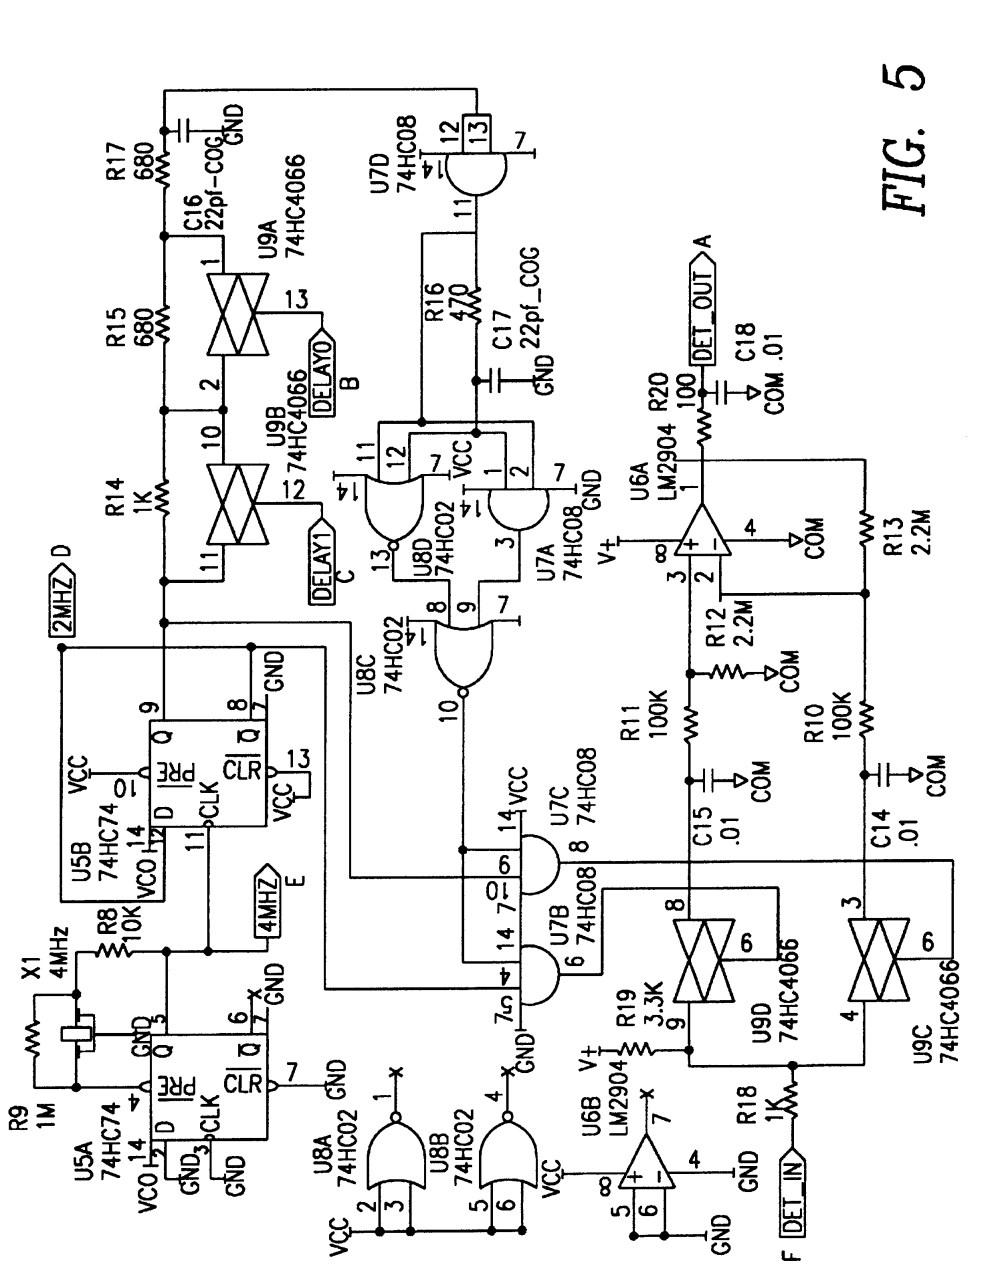 medium resolution of traulsen parts diagrams wiring diagram z4aht232nut traulsen wiring diagram z3 wiring library diagram traulsen service manuals